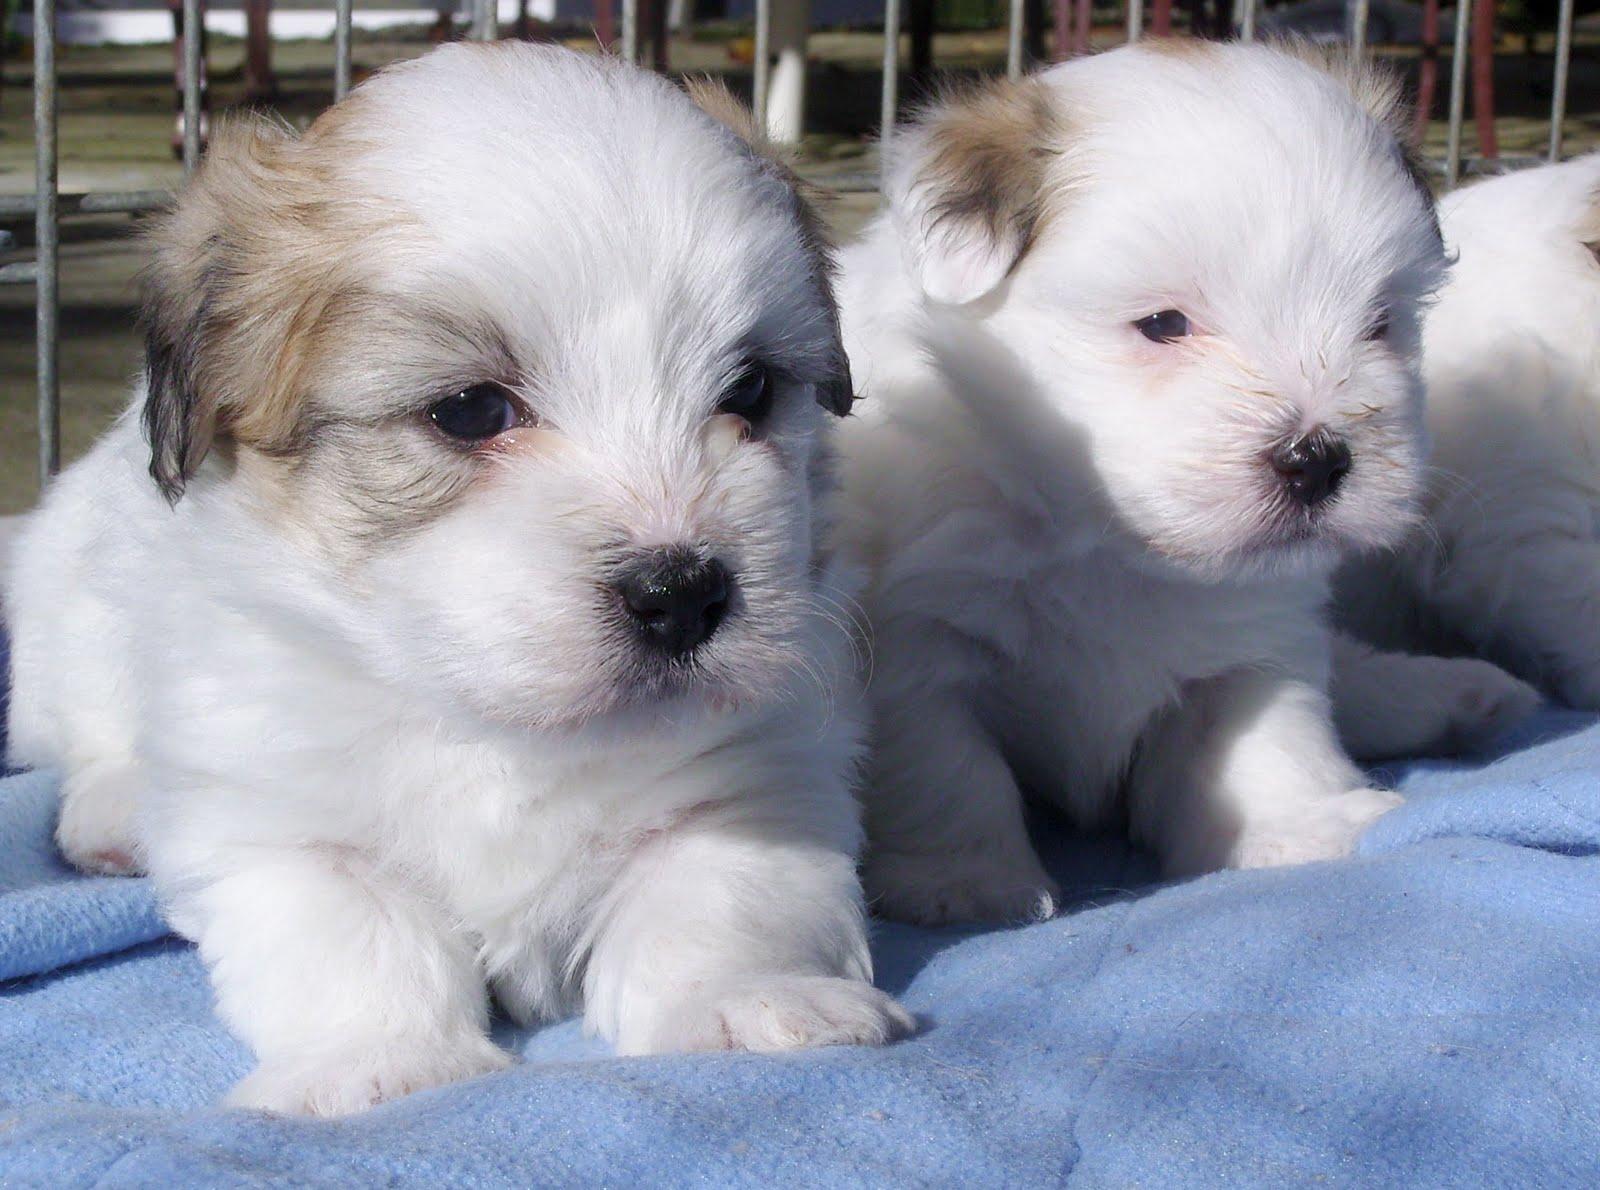 Coton de Tulear Puppies: Coton Two Lovely Coton De Tulear Puppies Breed